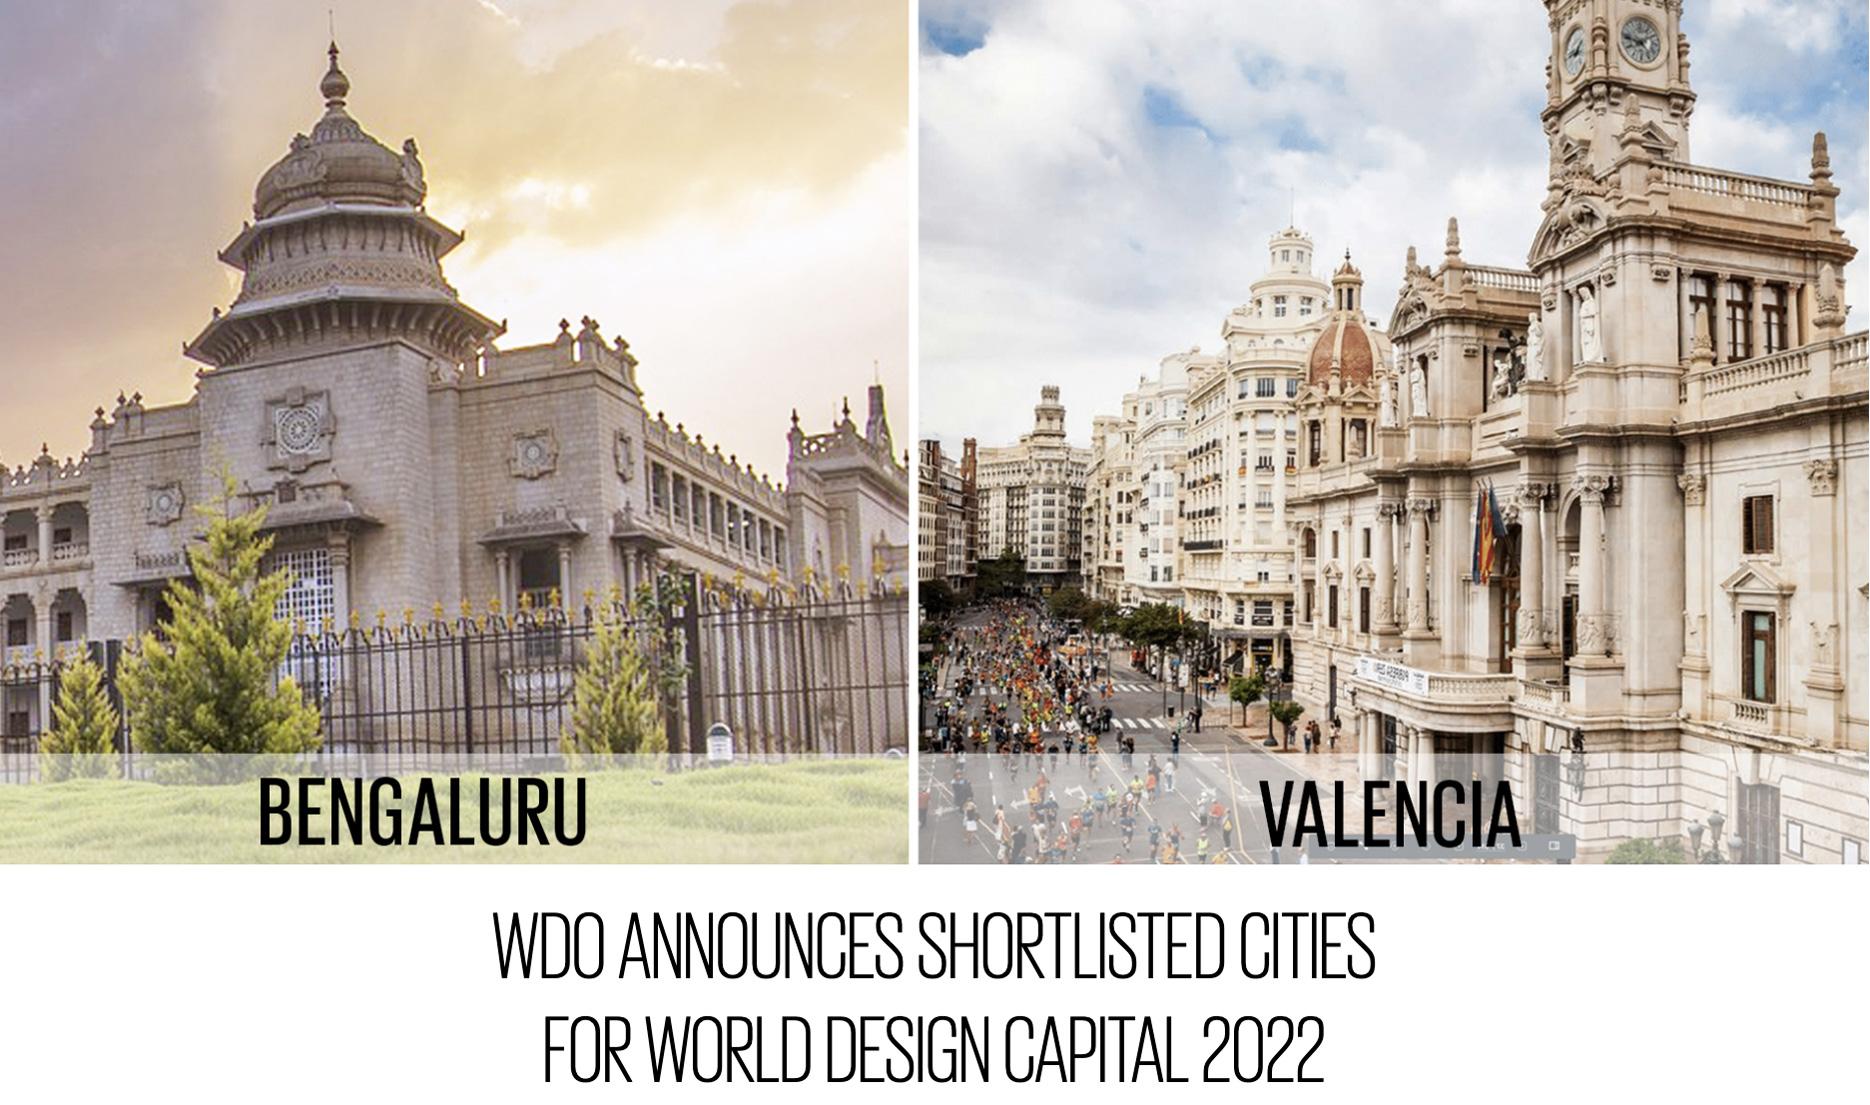 valencia finalista capital mundial del diseño 2022 (0)